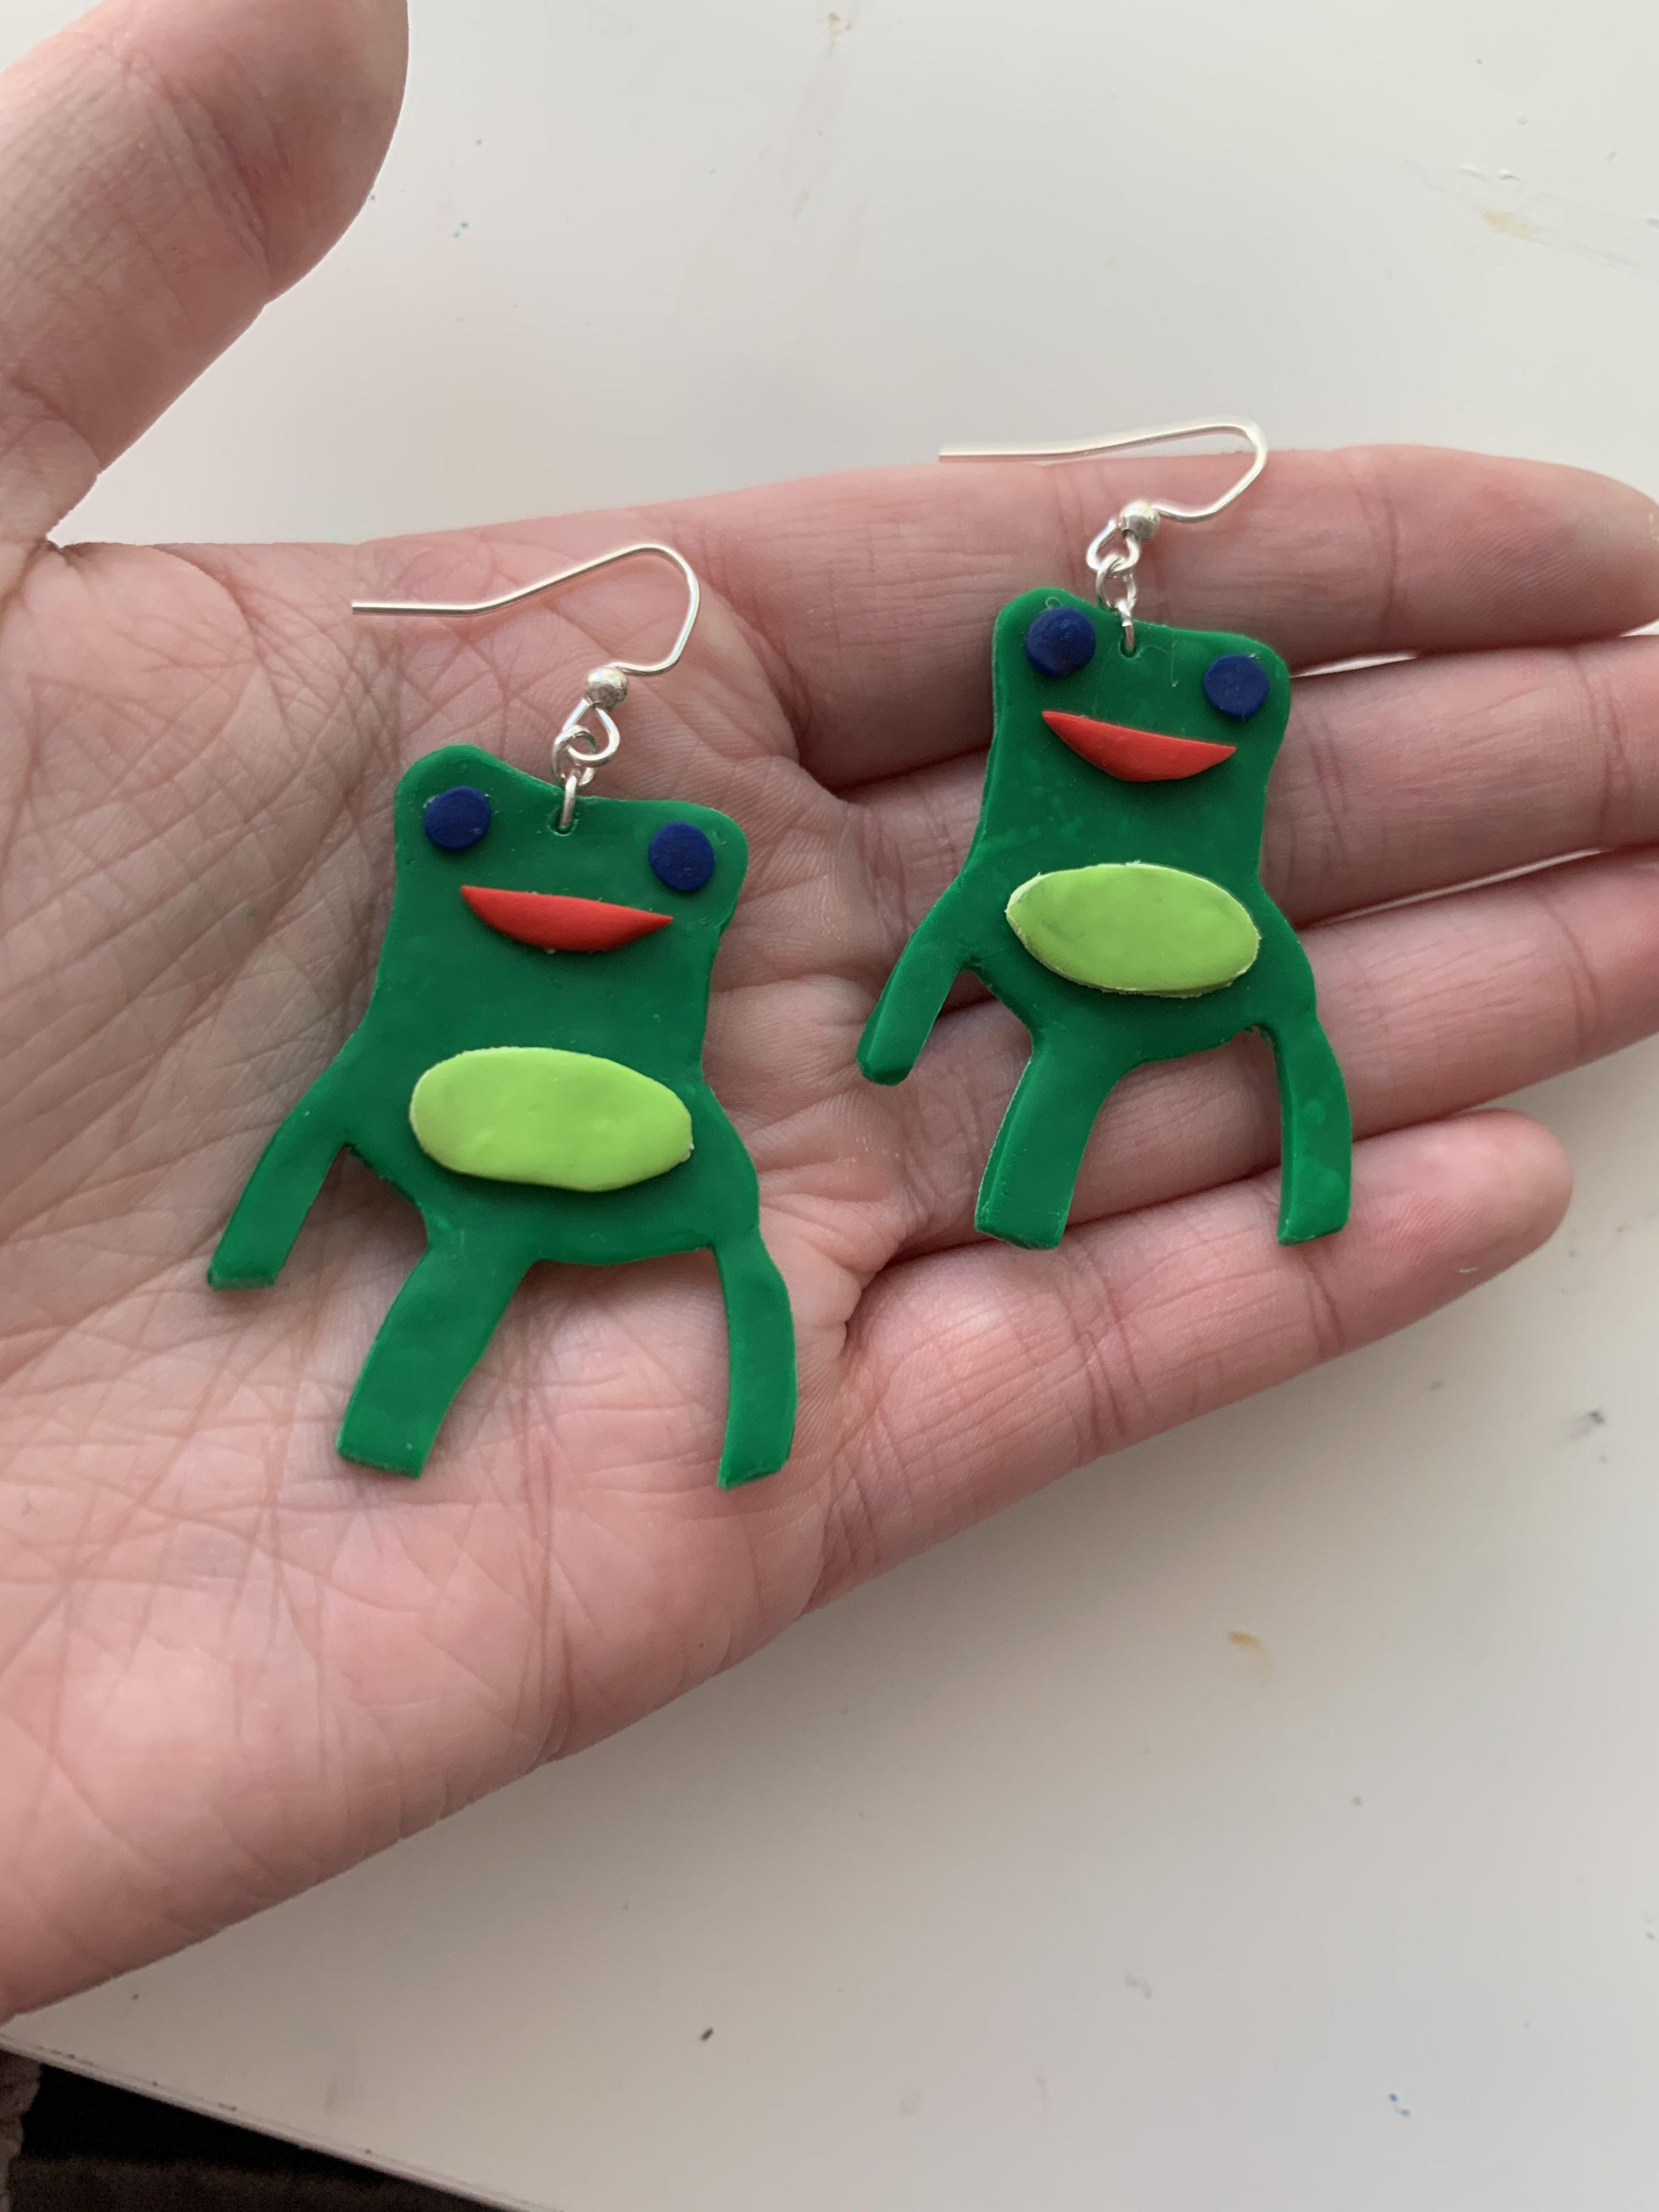 Animal Crossing Froggy Chair Earrings In 2020 Polymer Clay Animals Animal Crossing Polymer Clay Diy